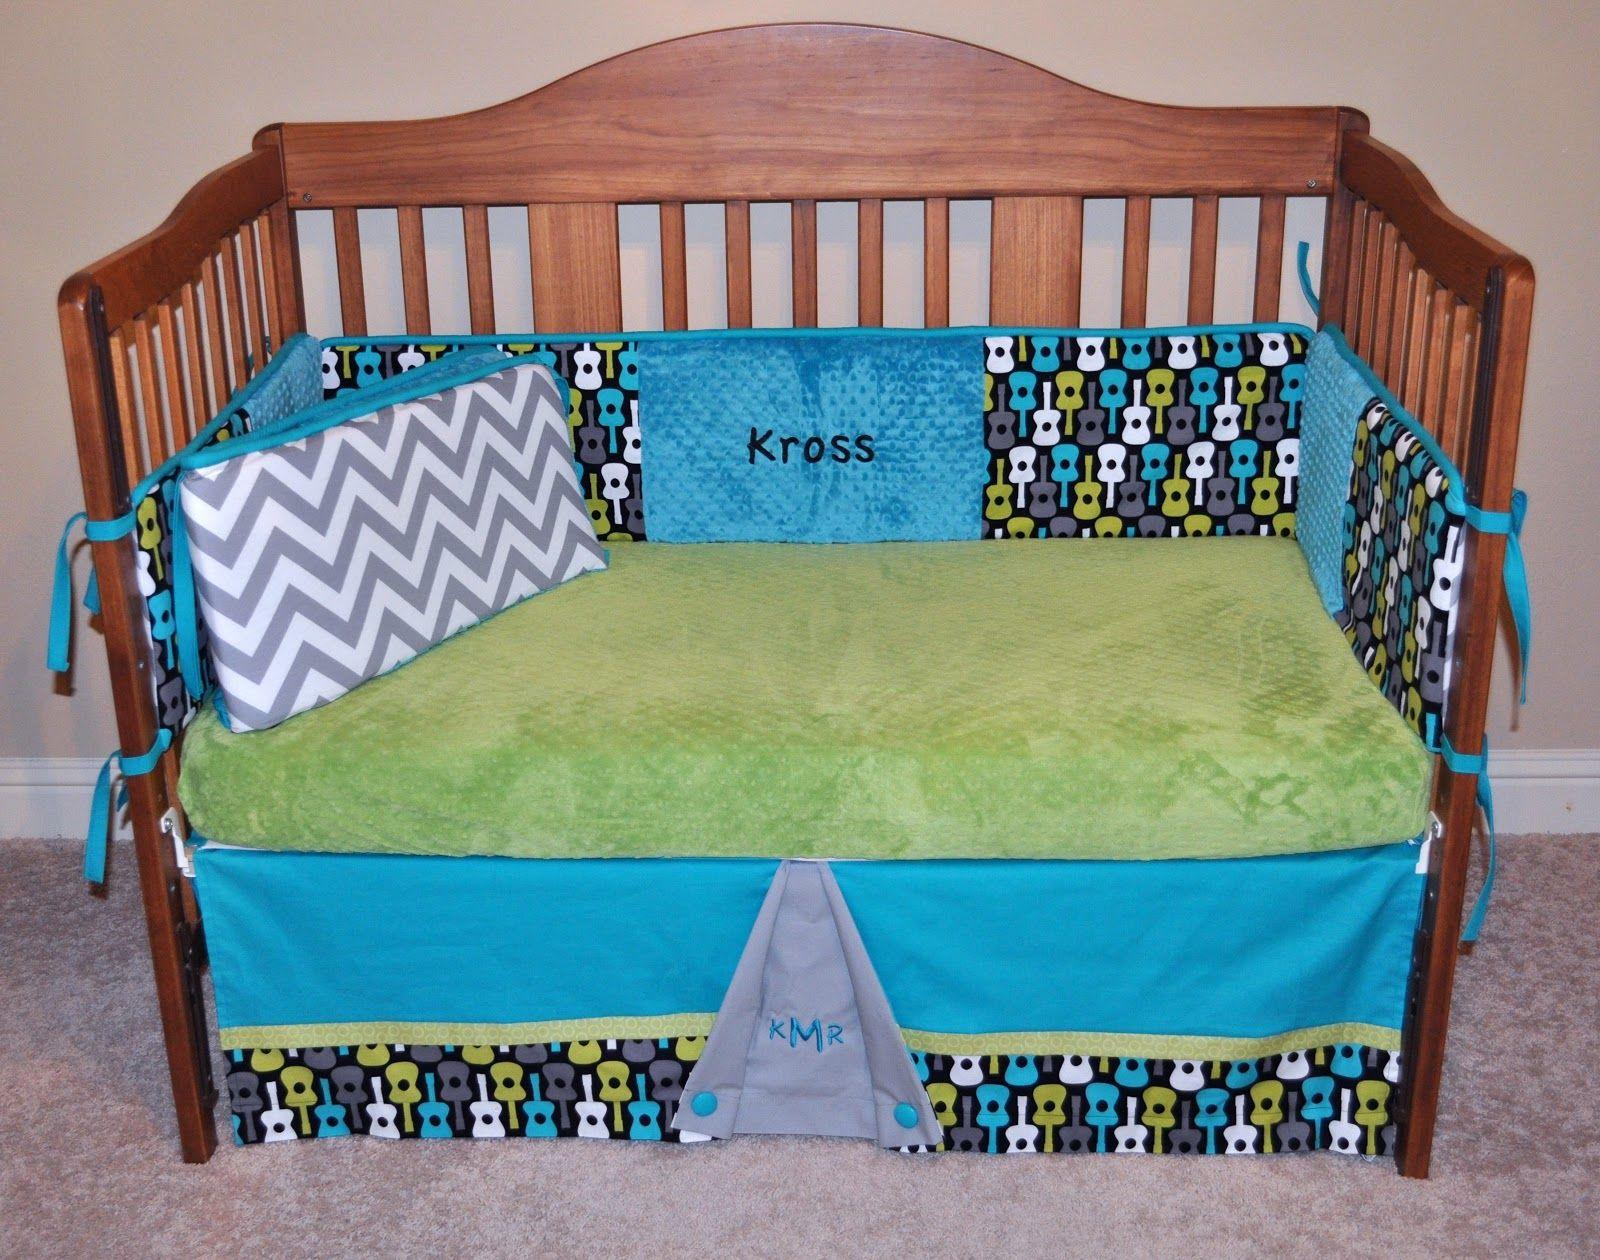 Precious and Prosperous Designs: Lagoon Groovy Guitar Crib Bedding